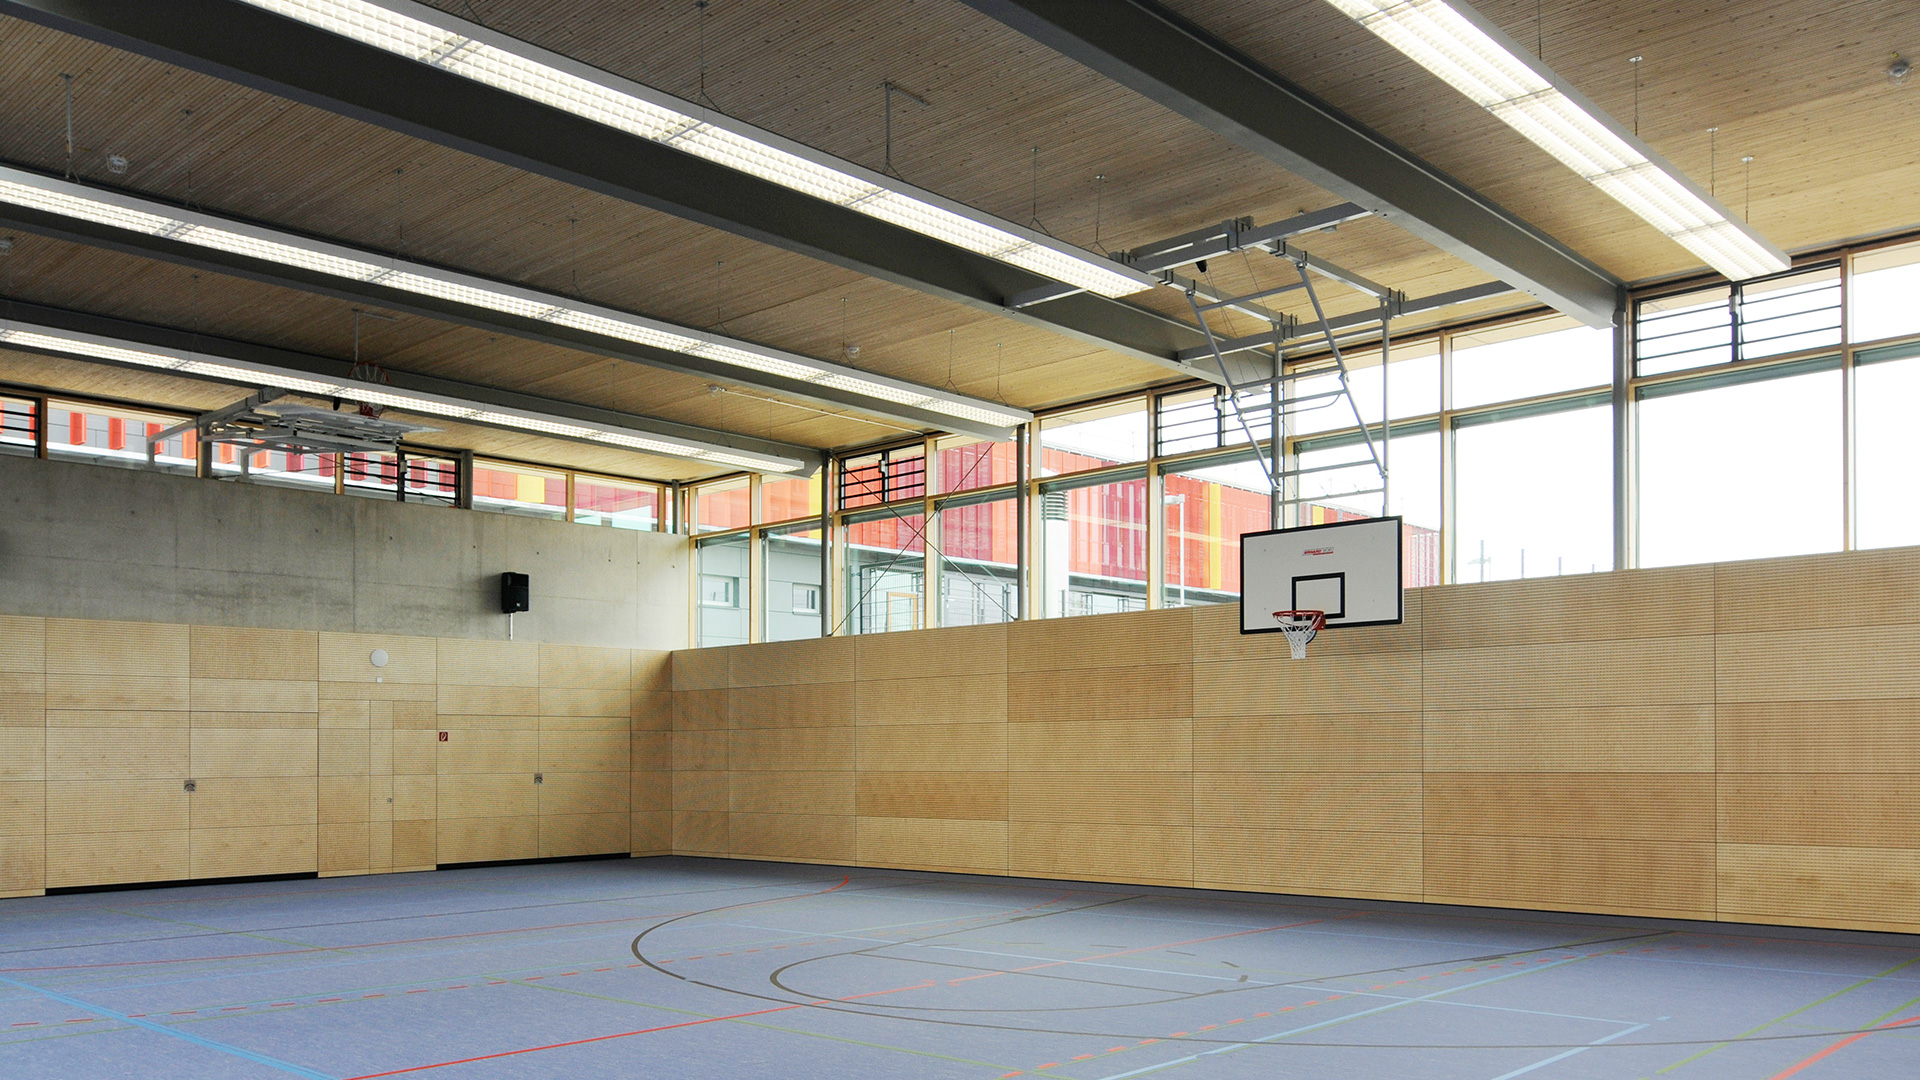 Sporthalle Neubiberg innen